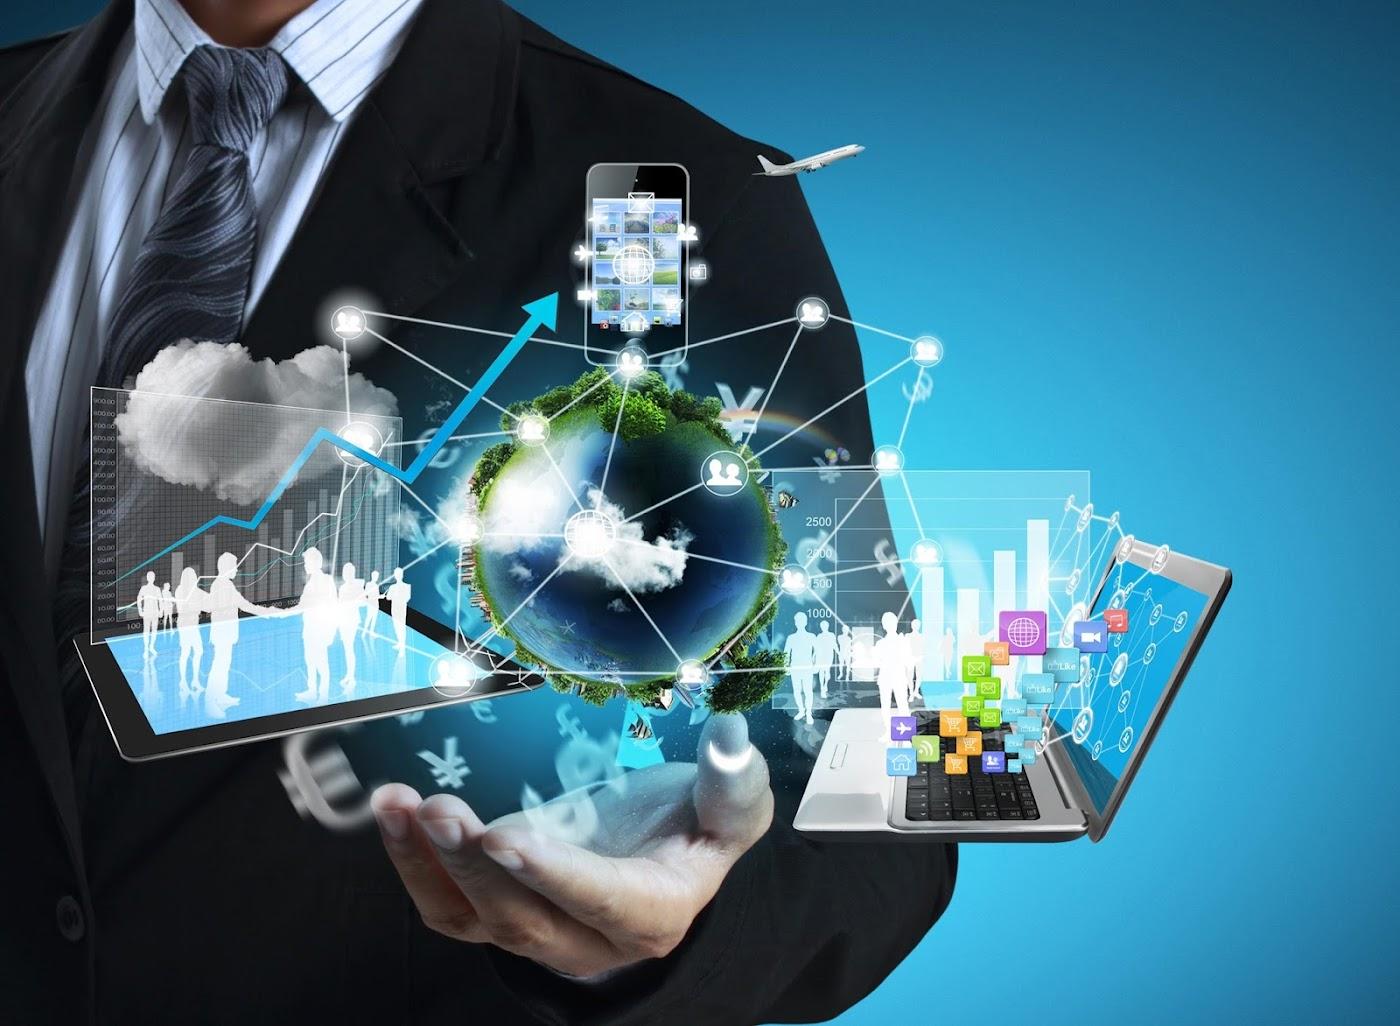 http://smarterware.org/wp-content/uploads/2016/09/technology1.jpg